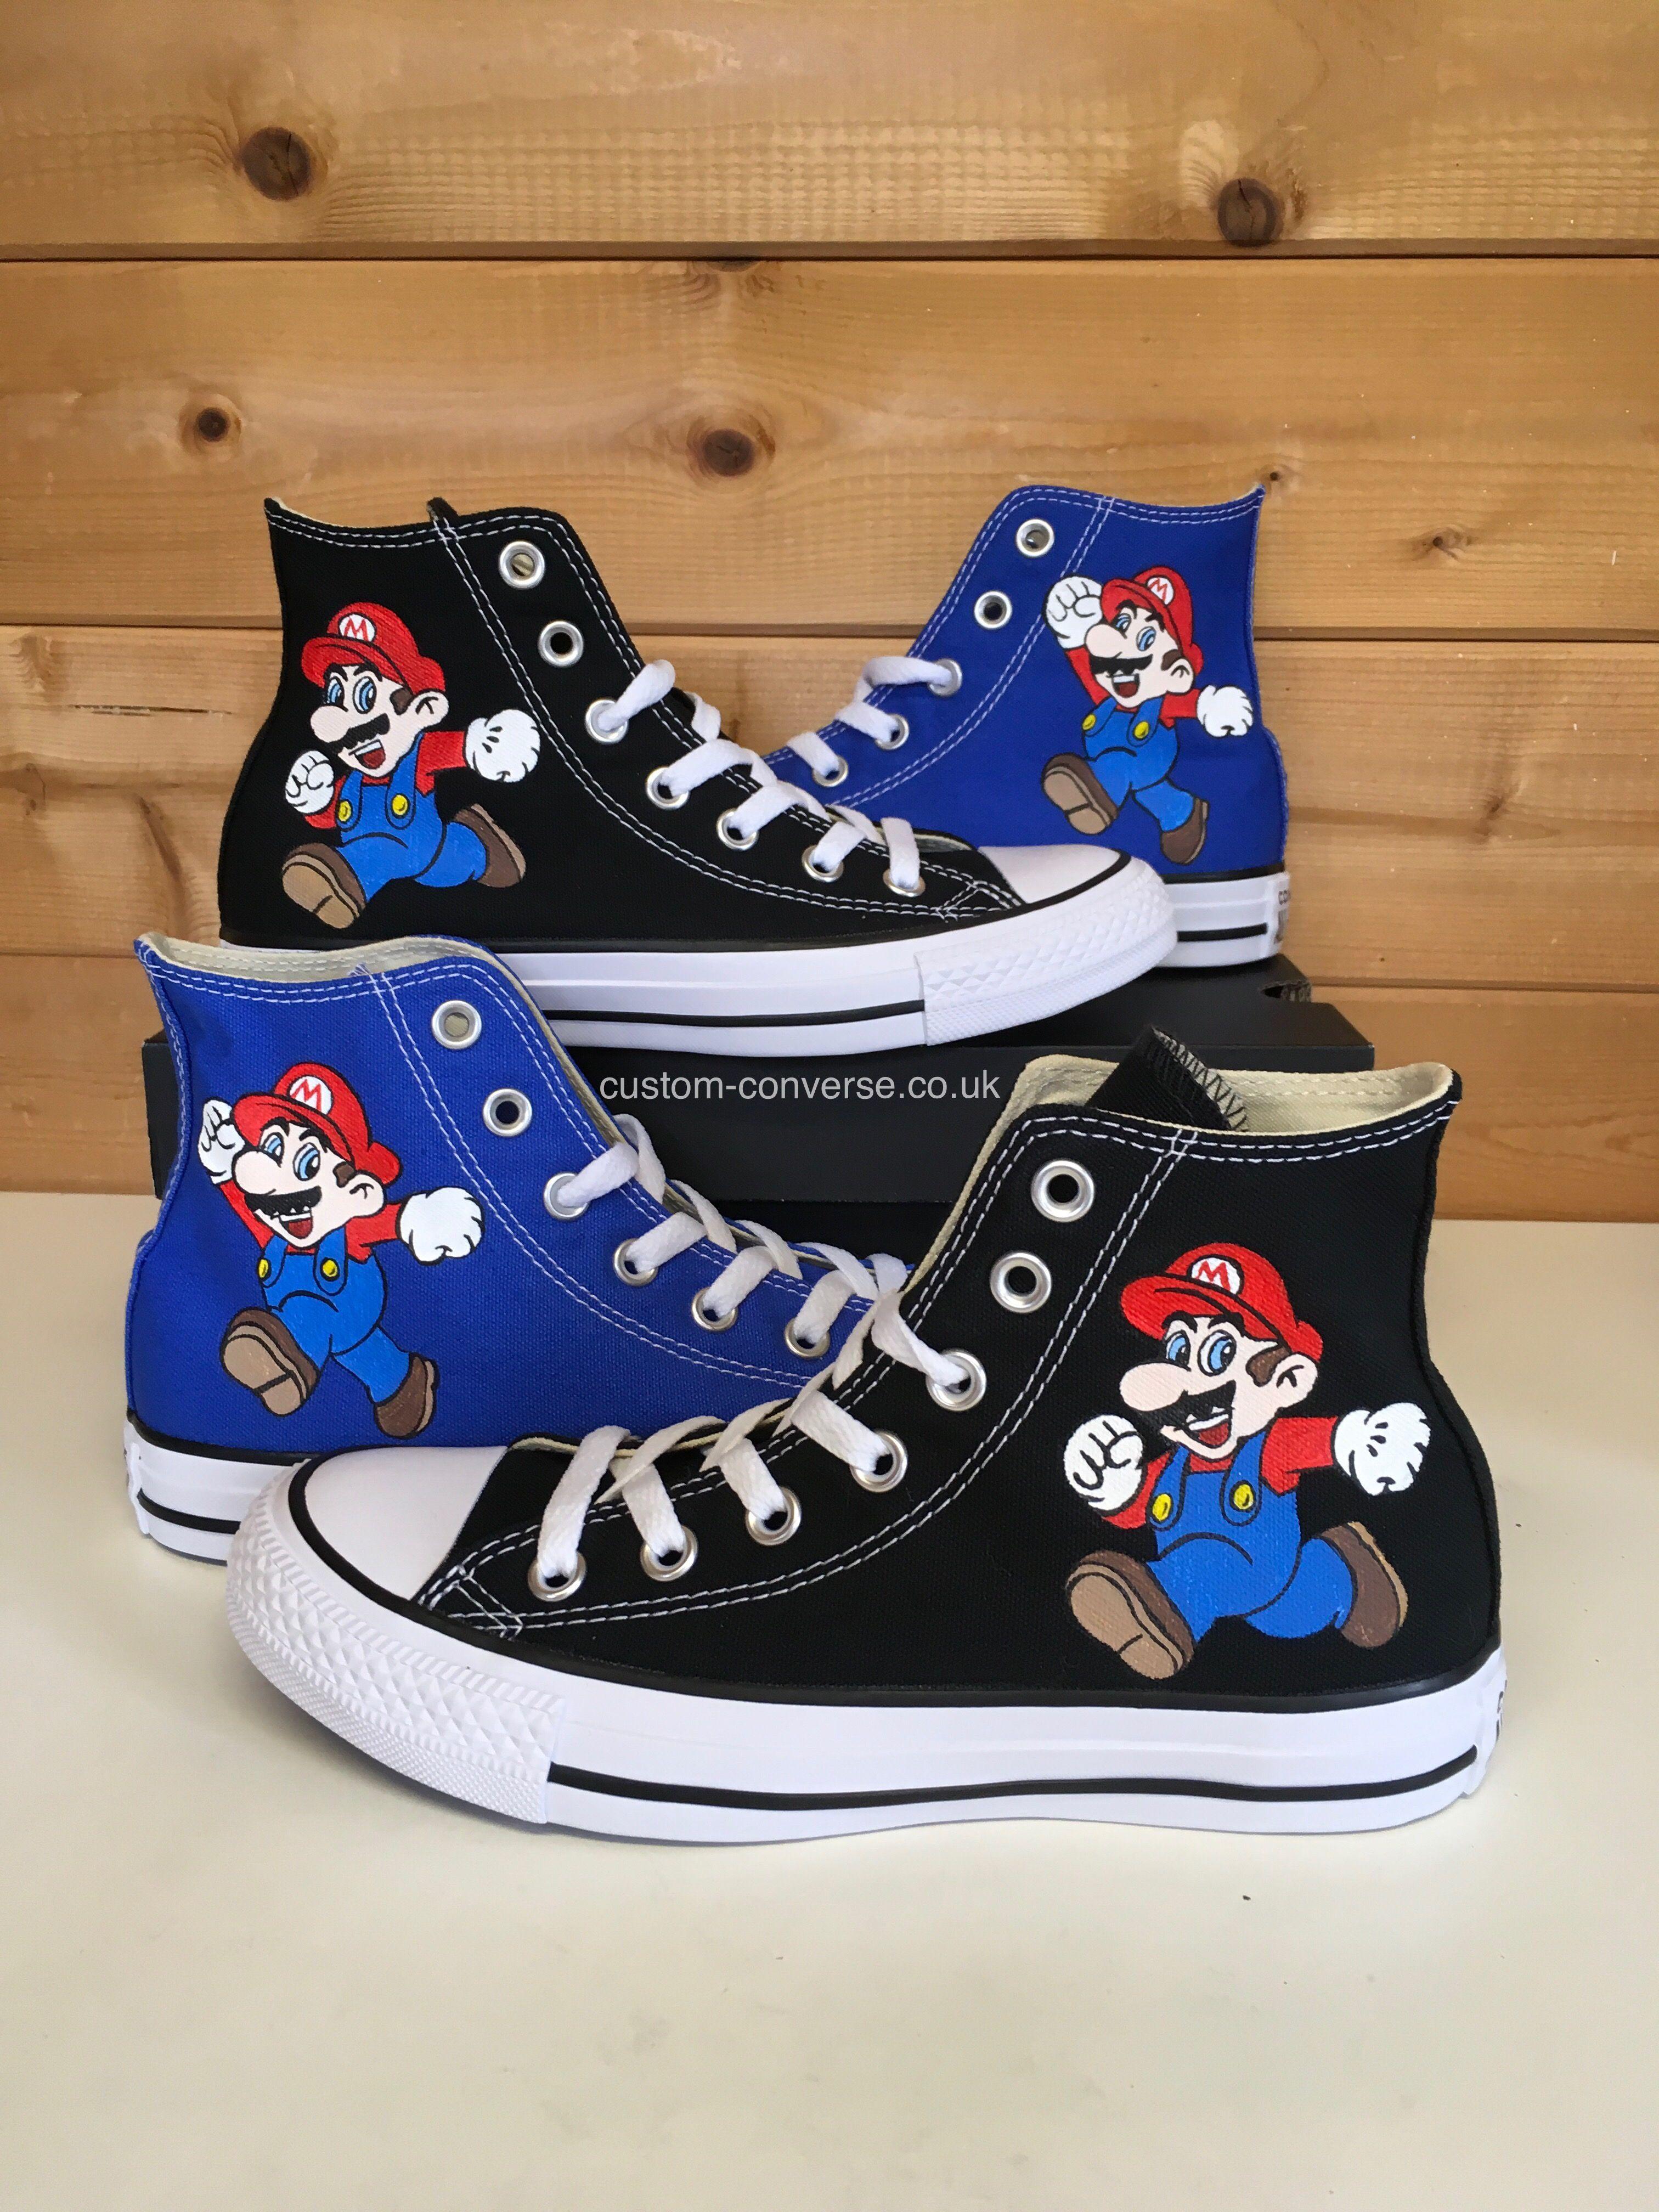 Super Mario High Top Converse  converse  mario  supermario  nintendo  luigi   chucks  kicks  allstars  custom  handpainted  personalized 890e25fc2